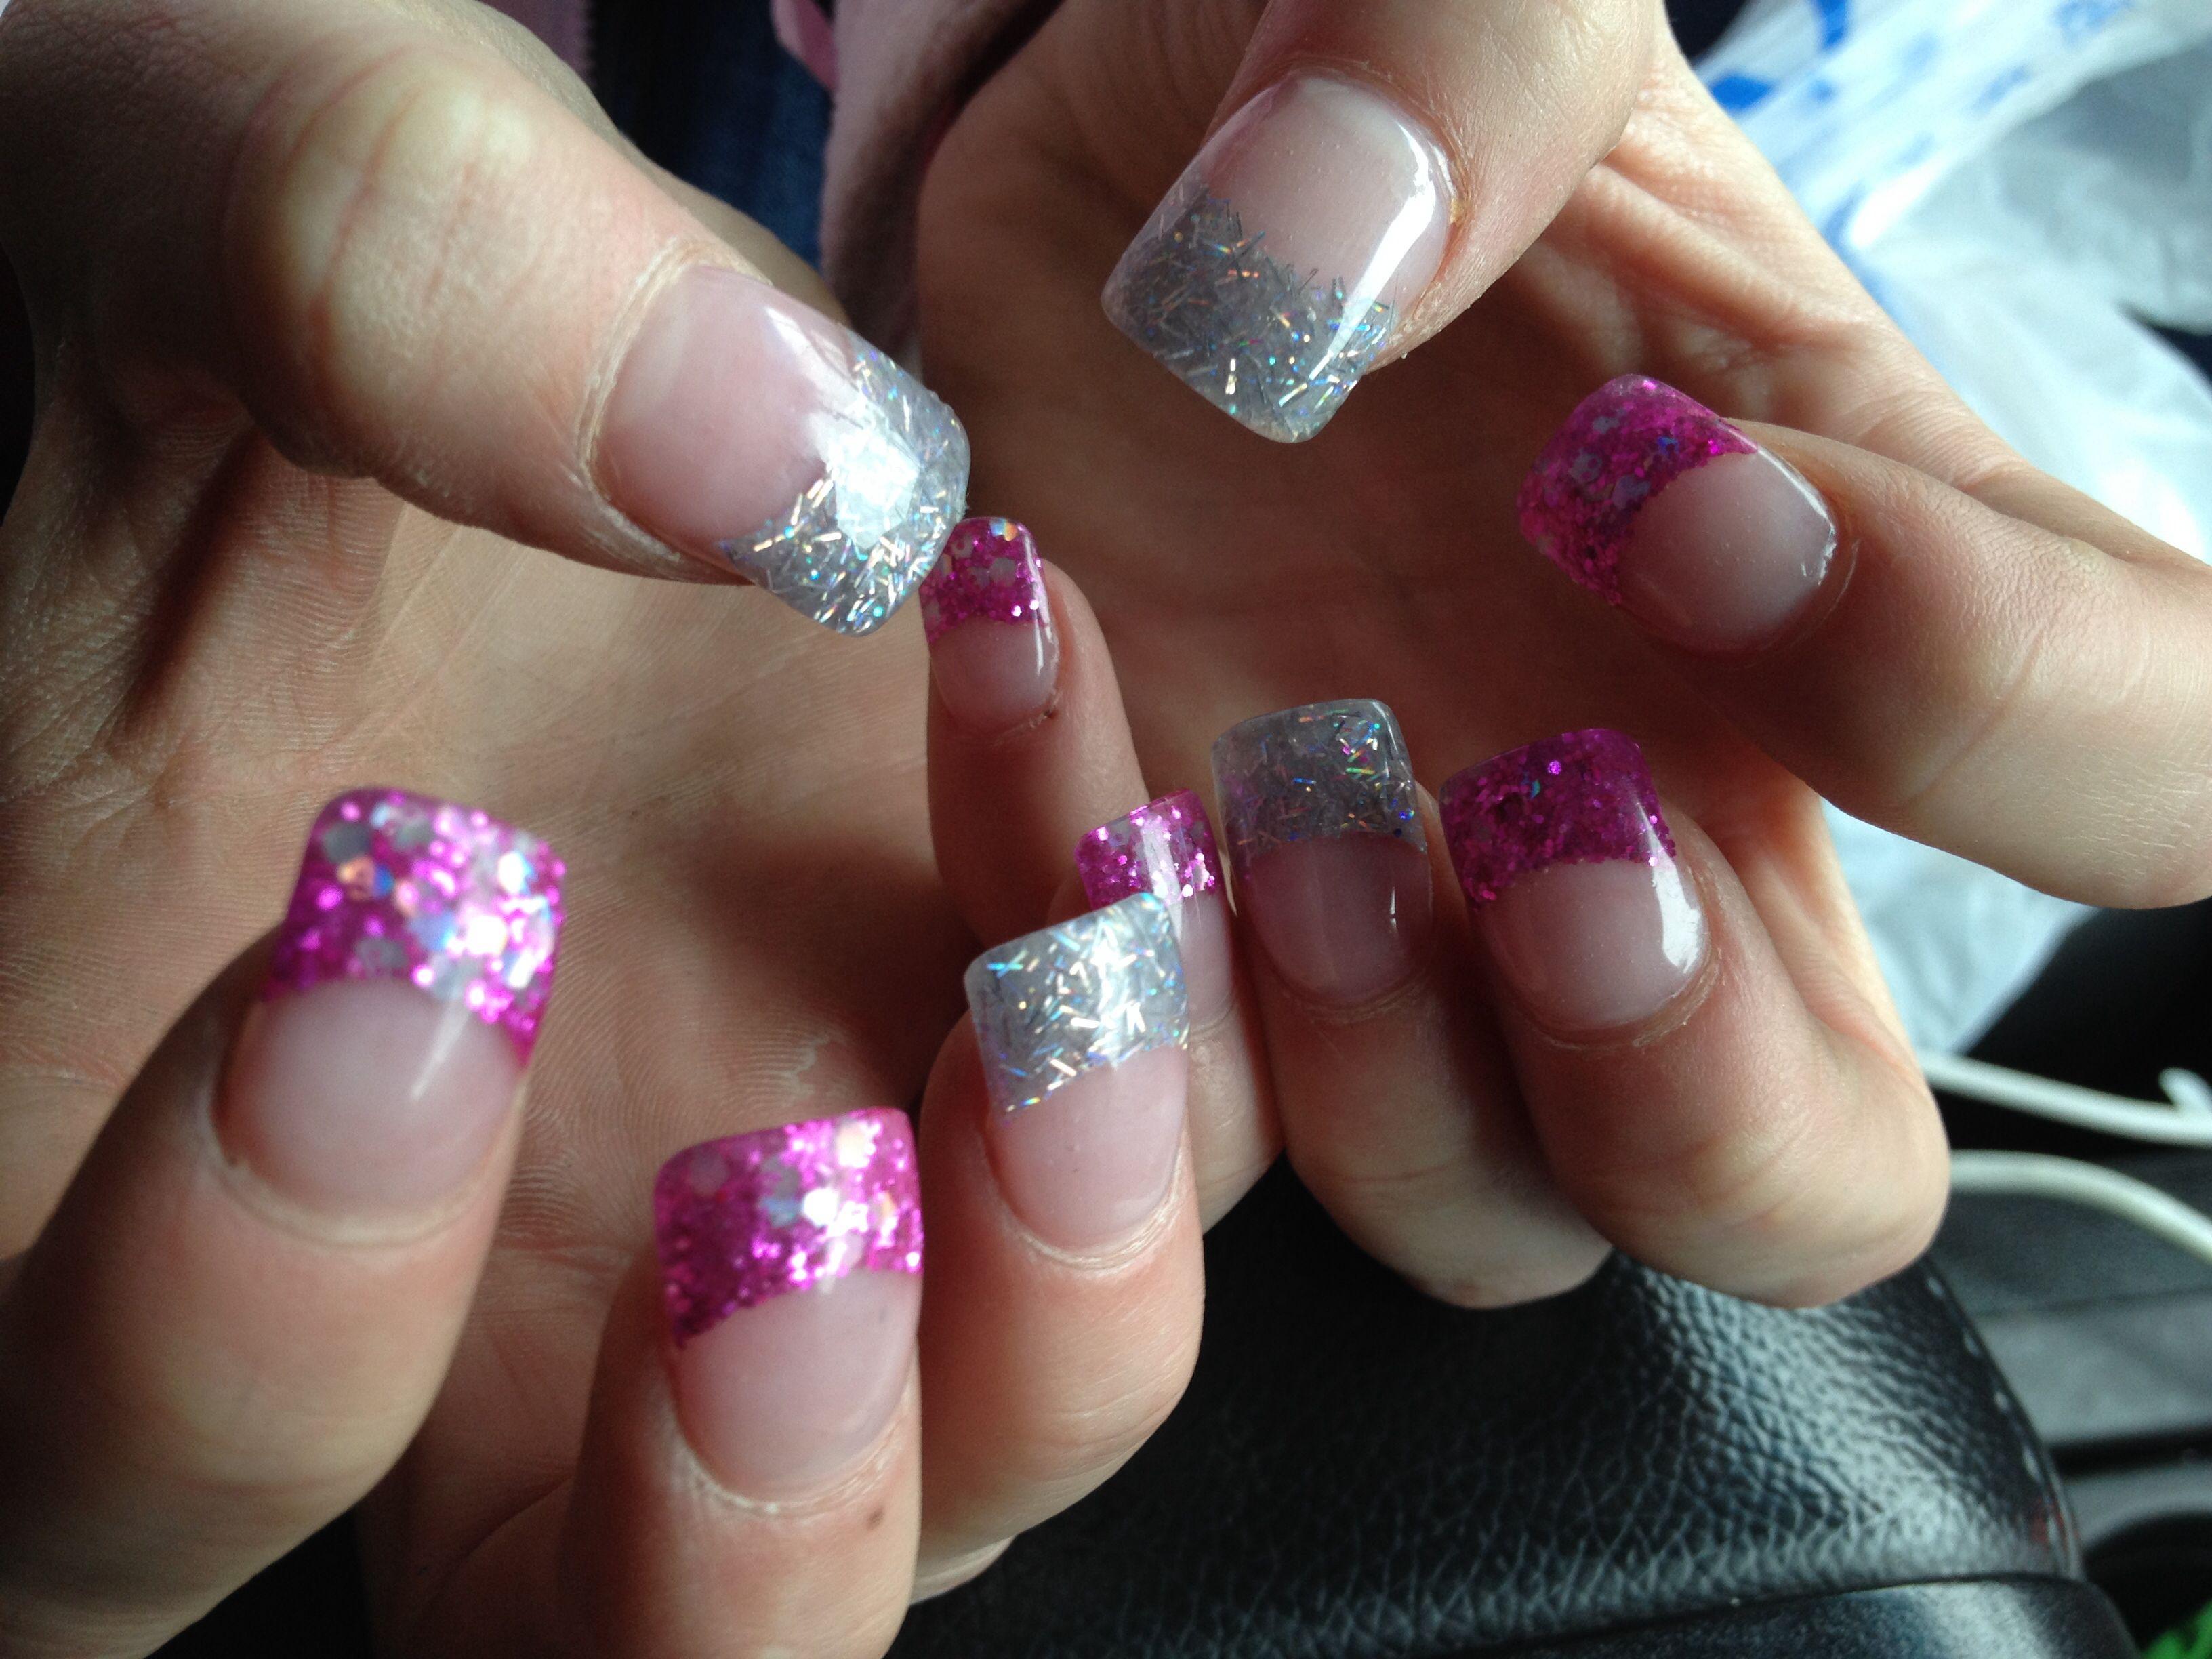 Lexi\'s new set of acrylic nails | Spirited Fingers | Pinterest ...